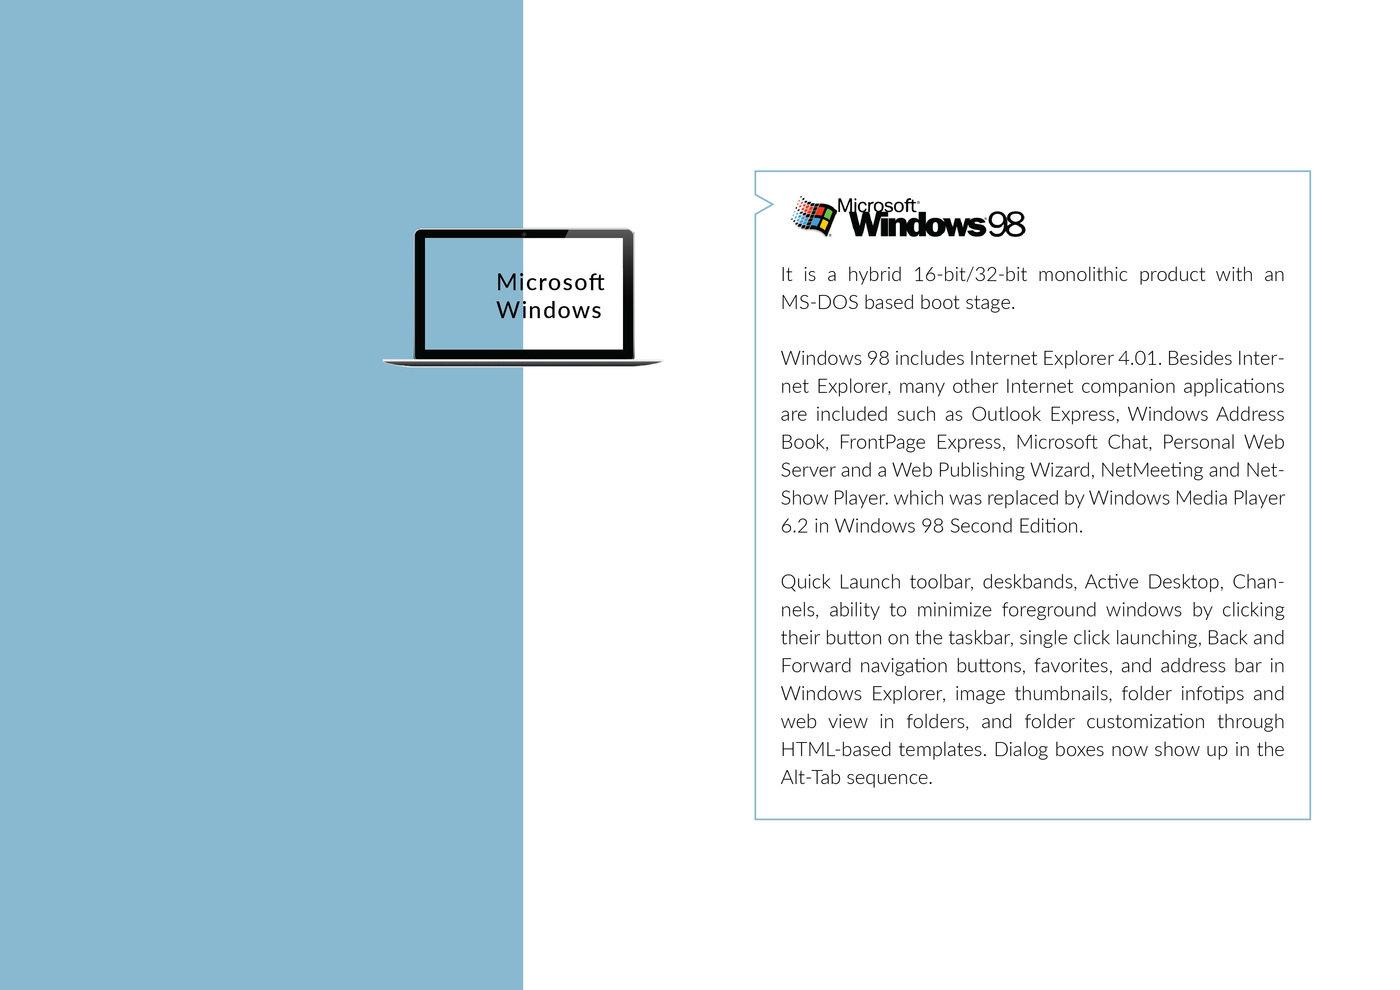 Presentation of Windows History by bindu vishwakarma at